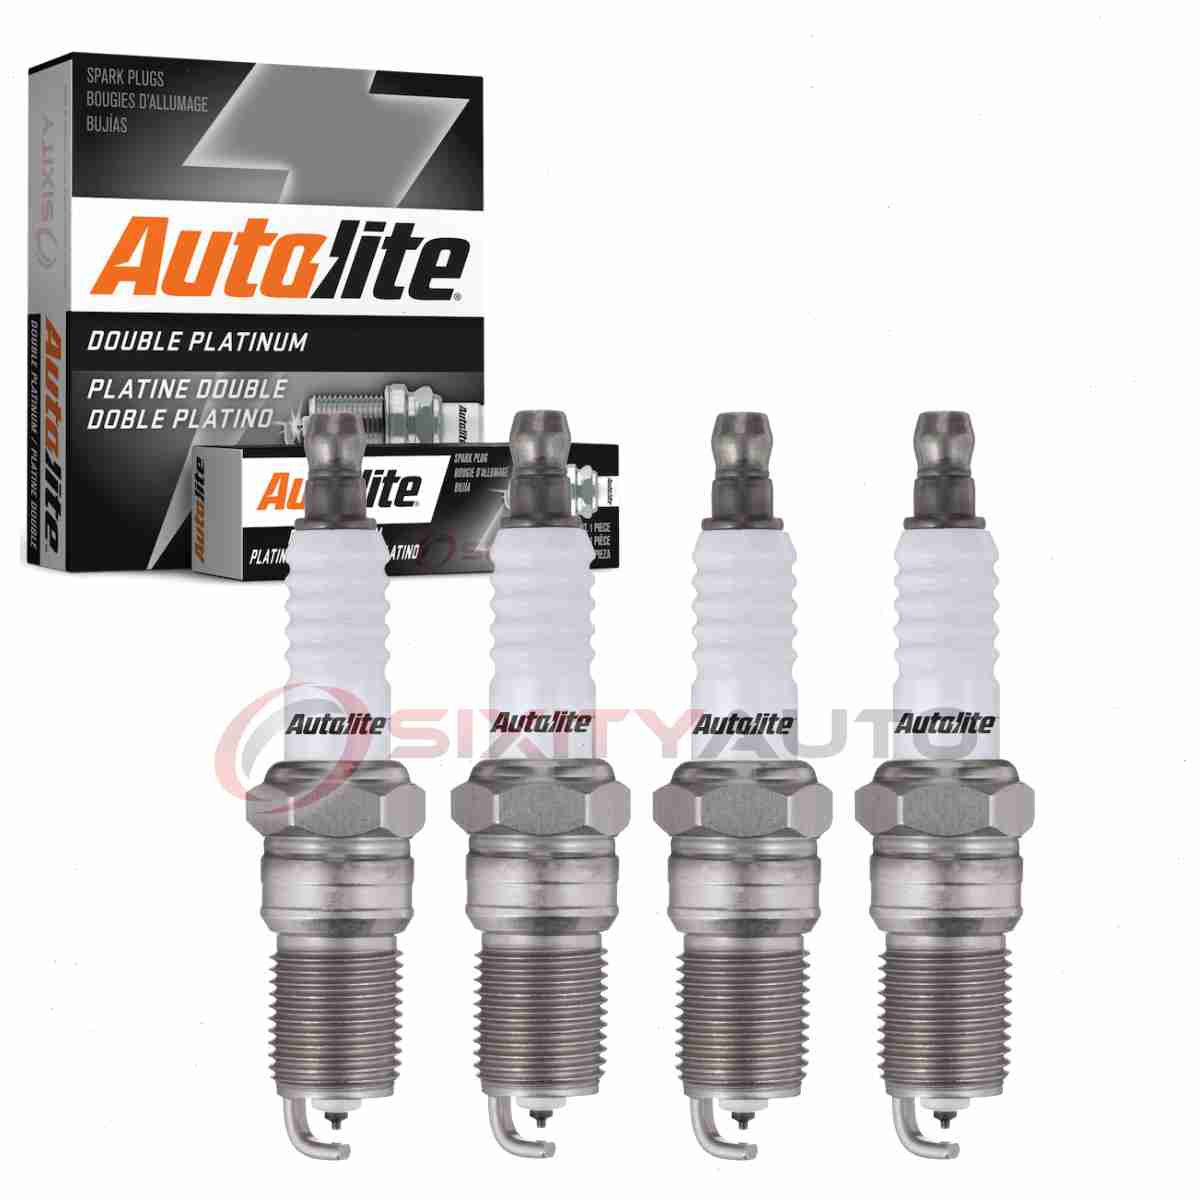 4 pcs Bosch Double Iridium Spark Plugs For 2019 FORD RANGER L4-2.3L